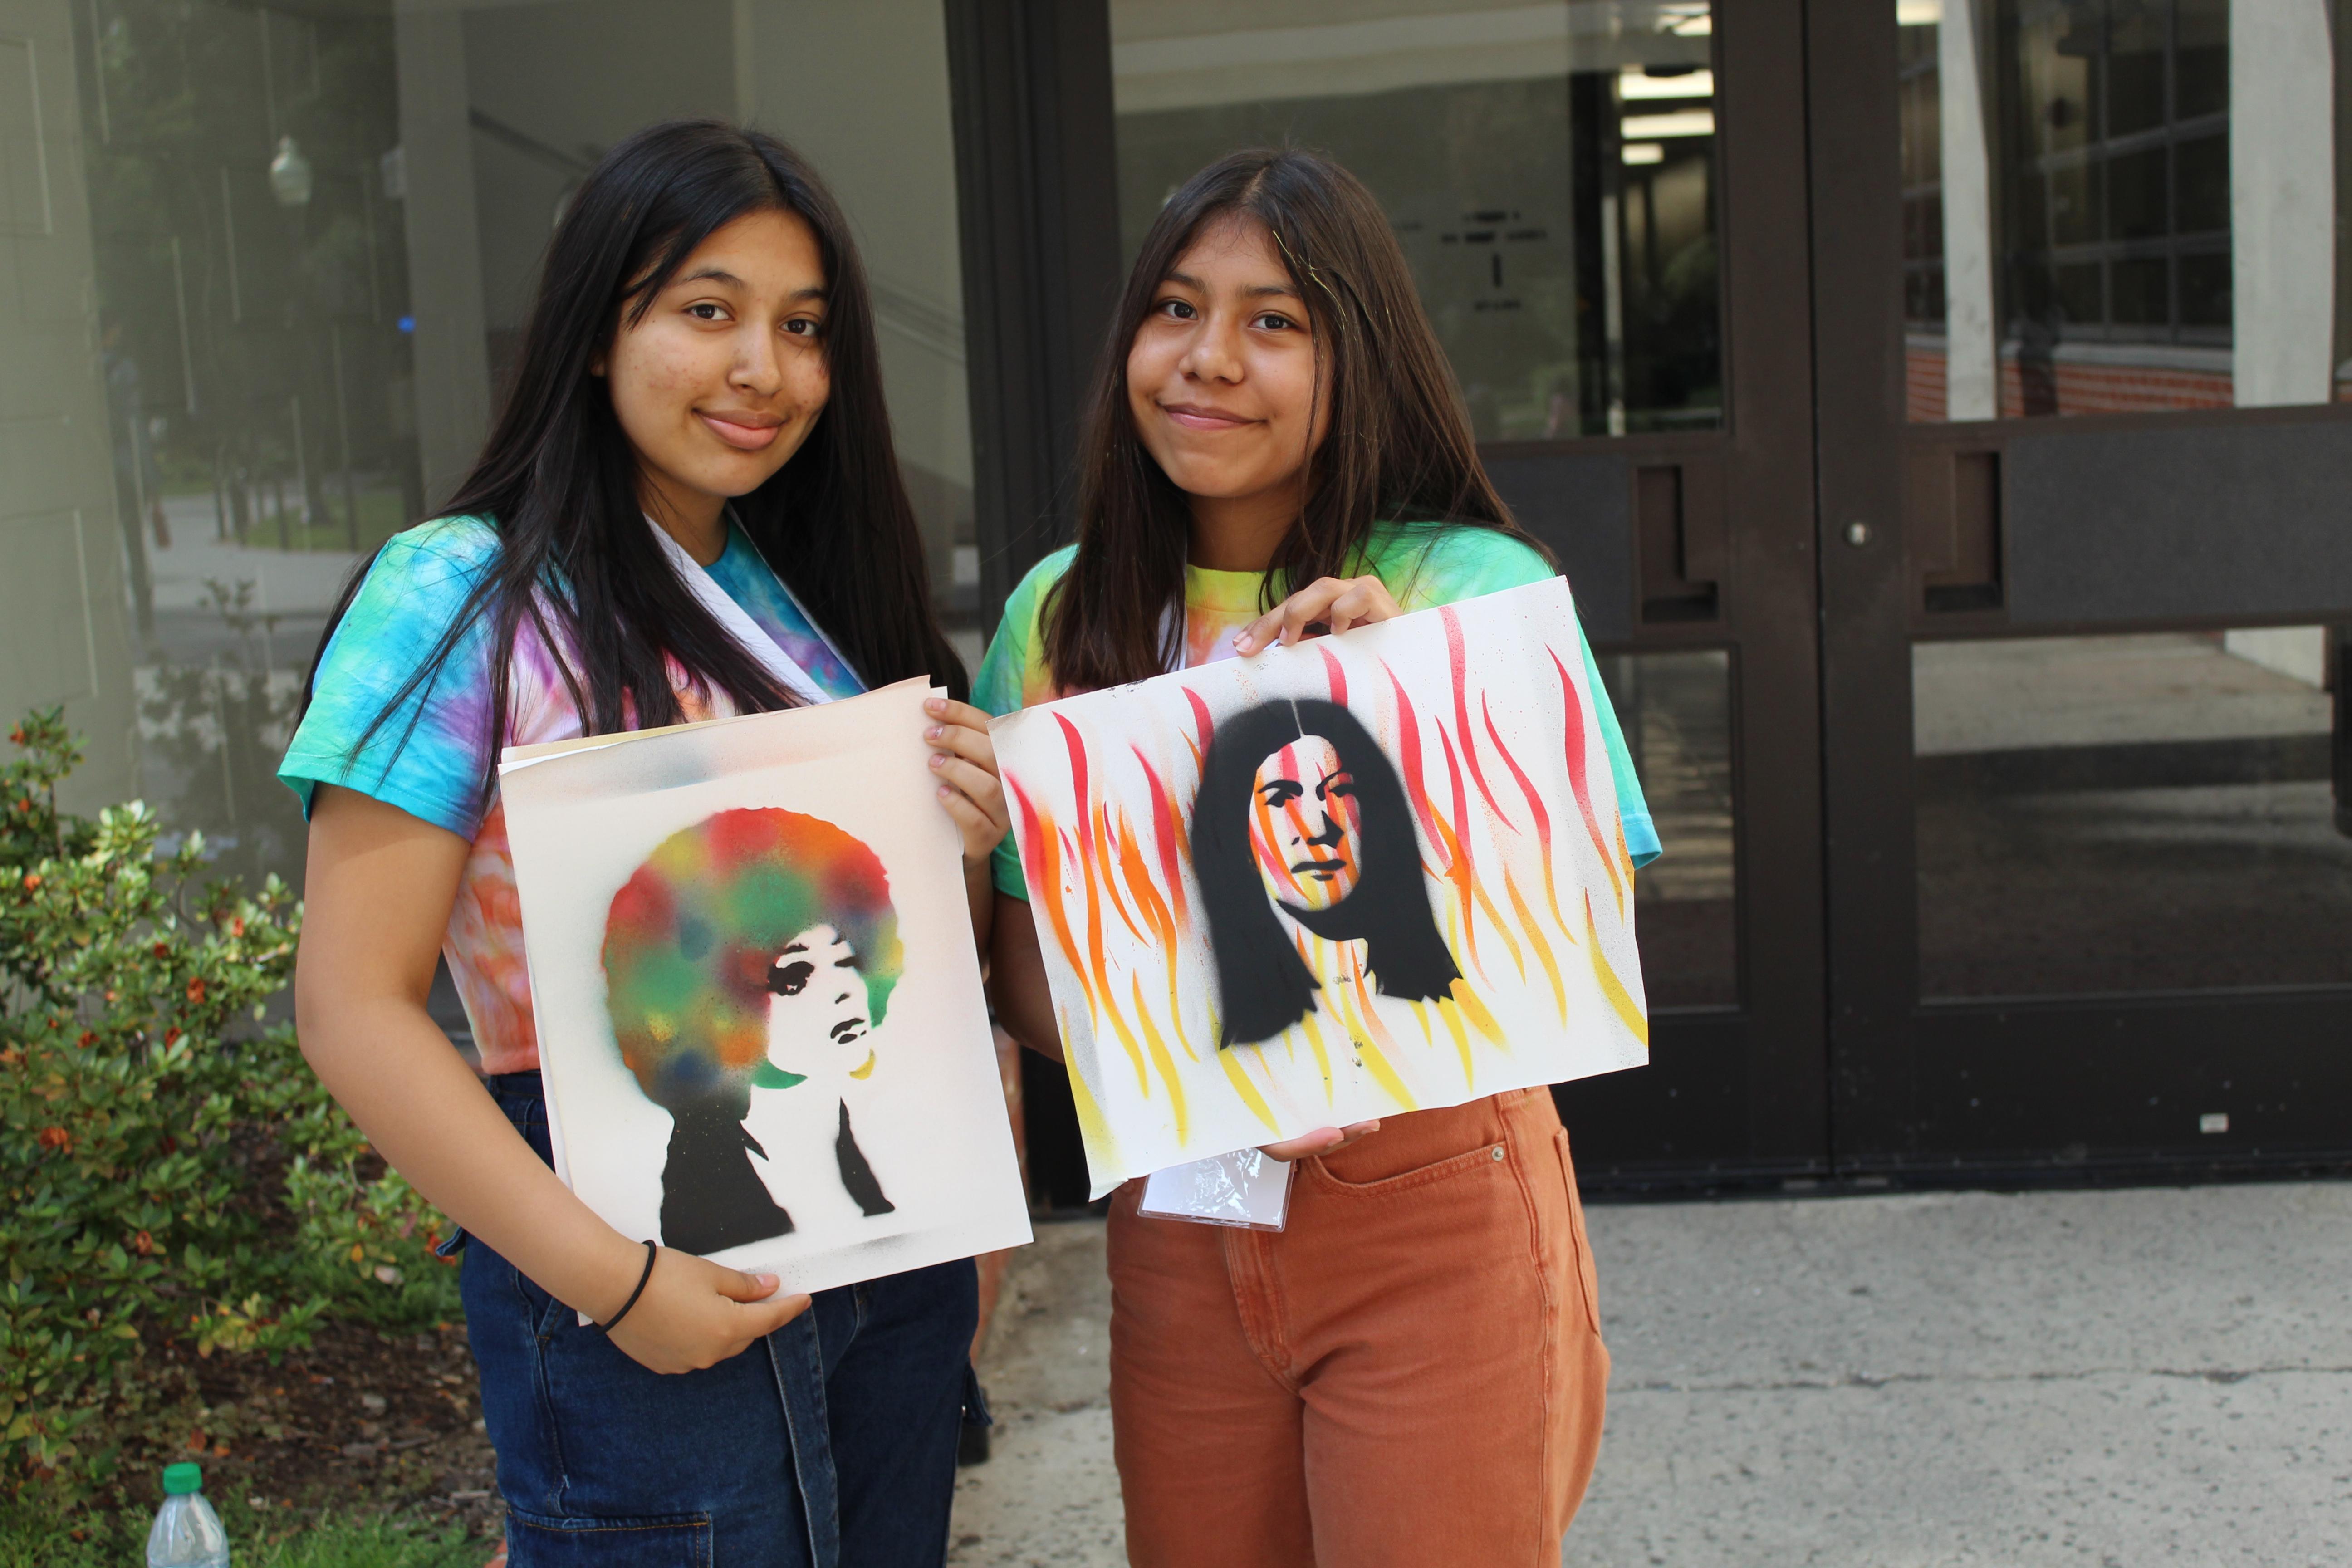 Youth stenciling at Activist Camp